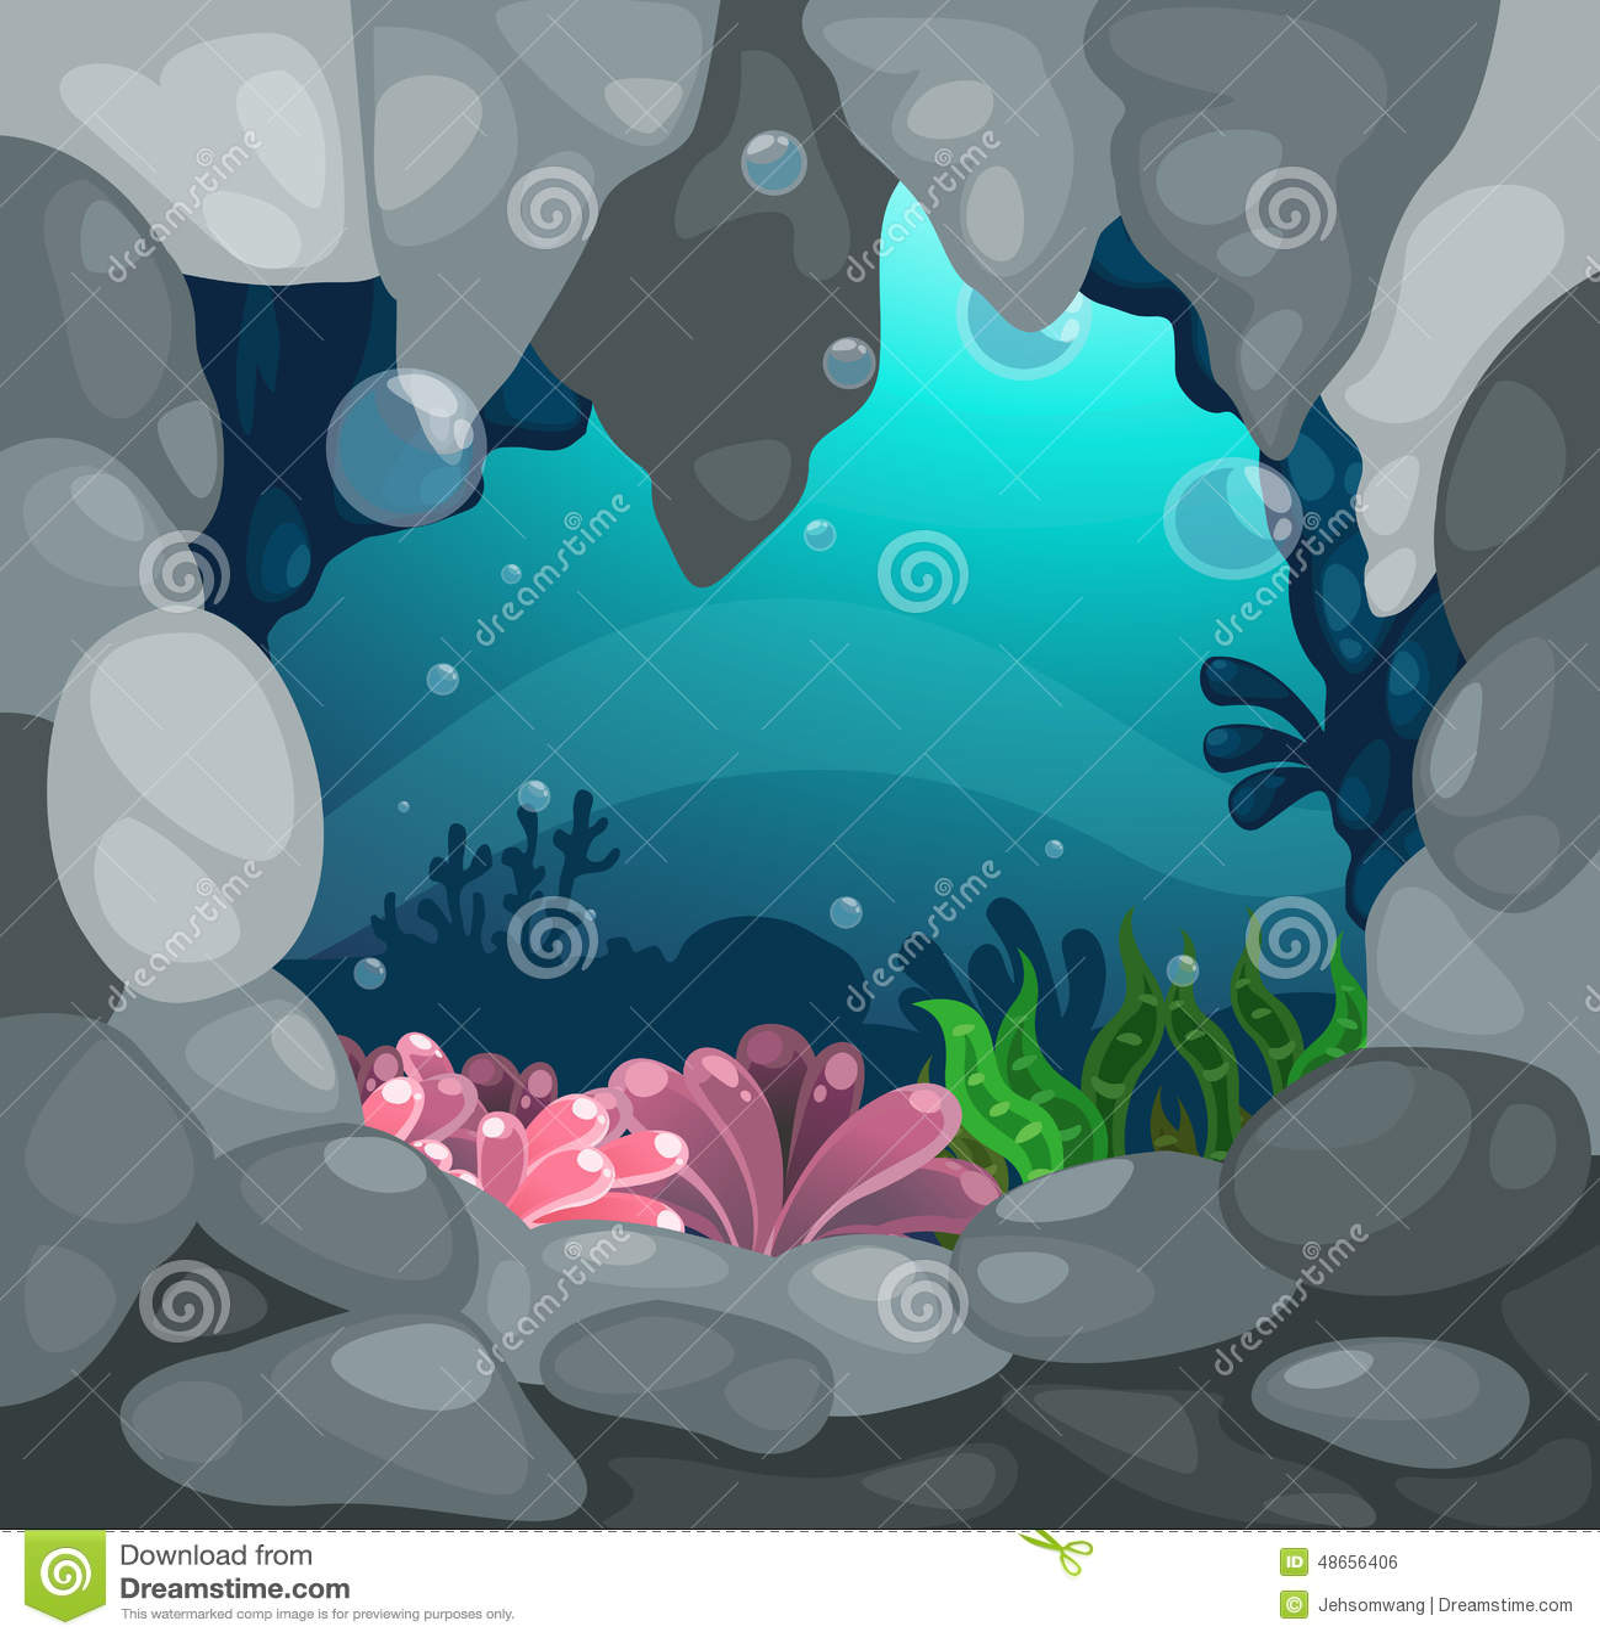 Stock Illustration Cave Under Sea Background Illustration Image4865640...